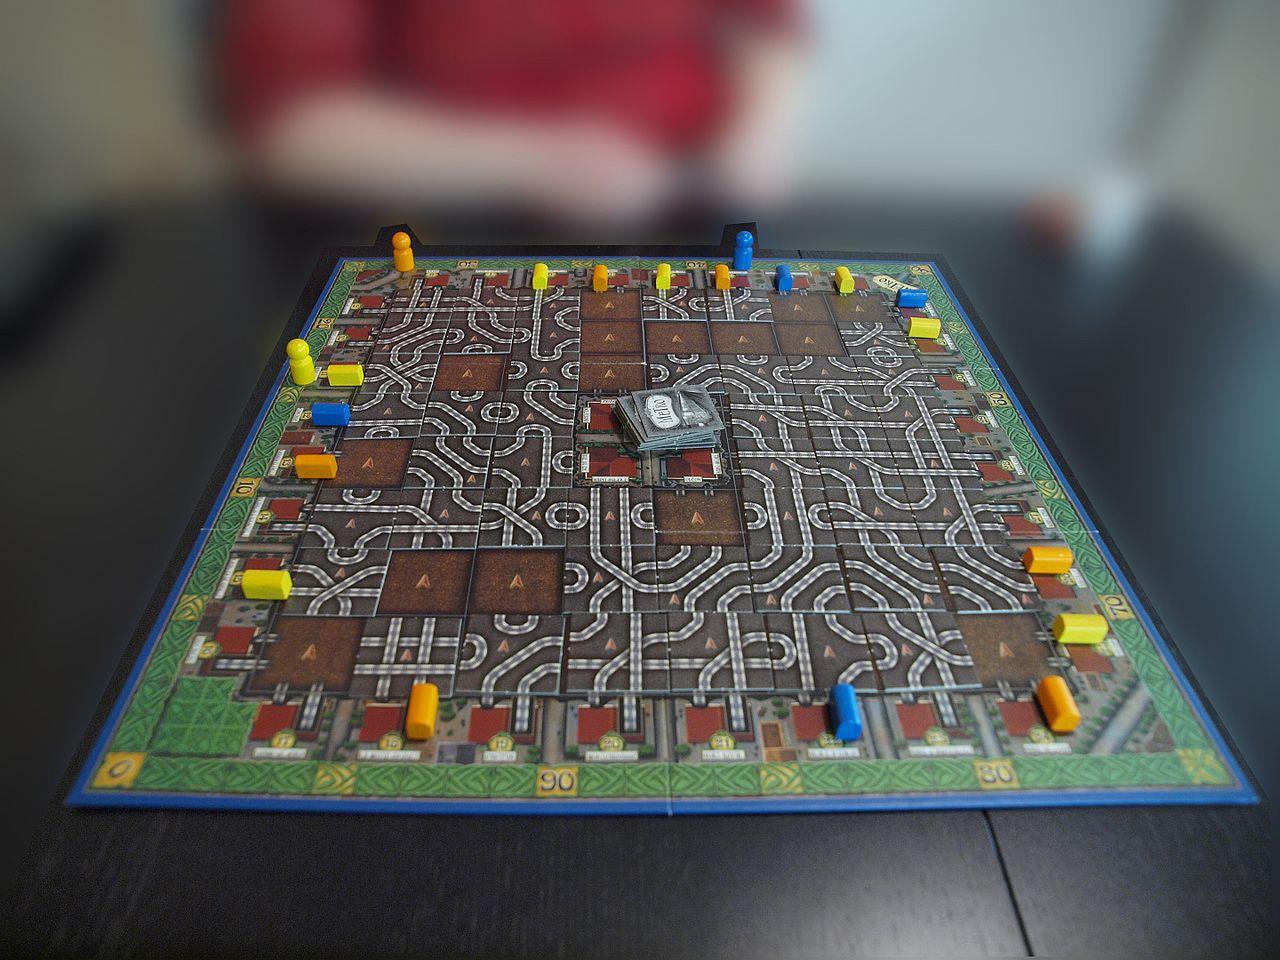 Filemetro Board Game Wikimedia Commons Circuit Games